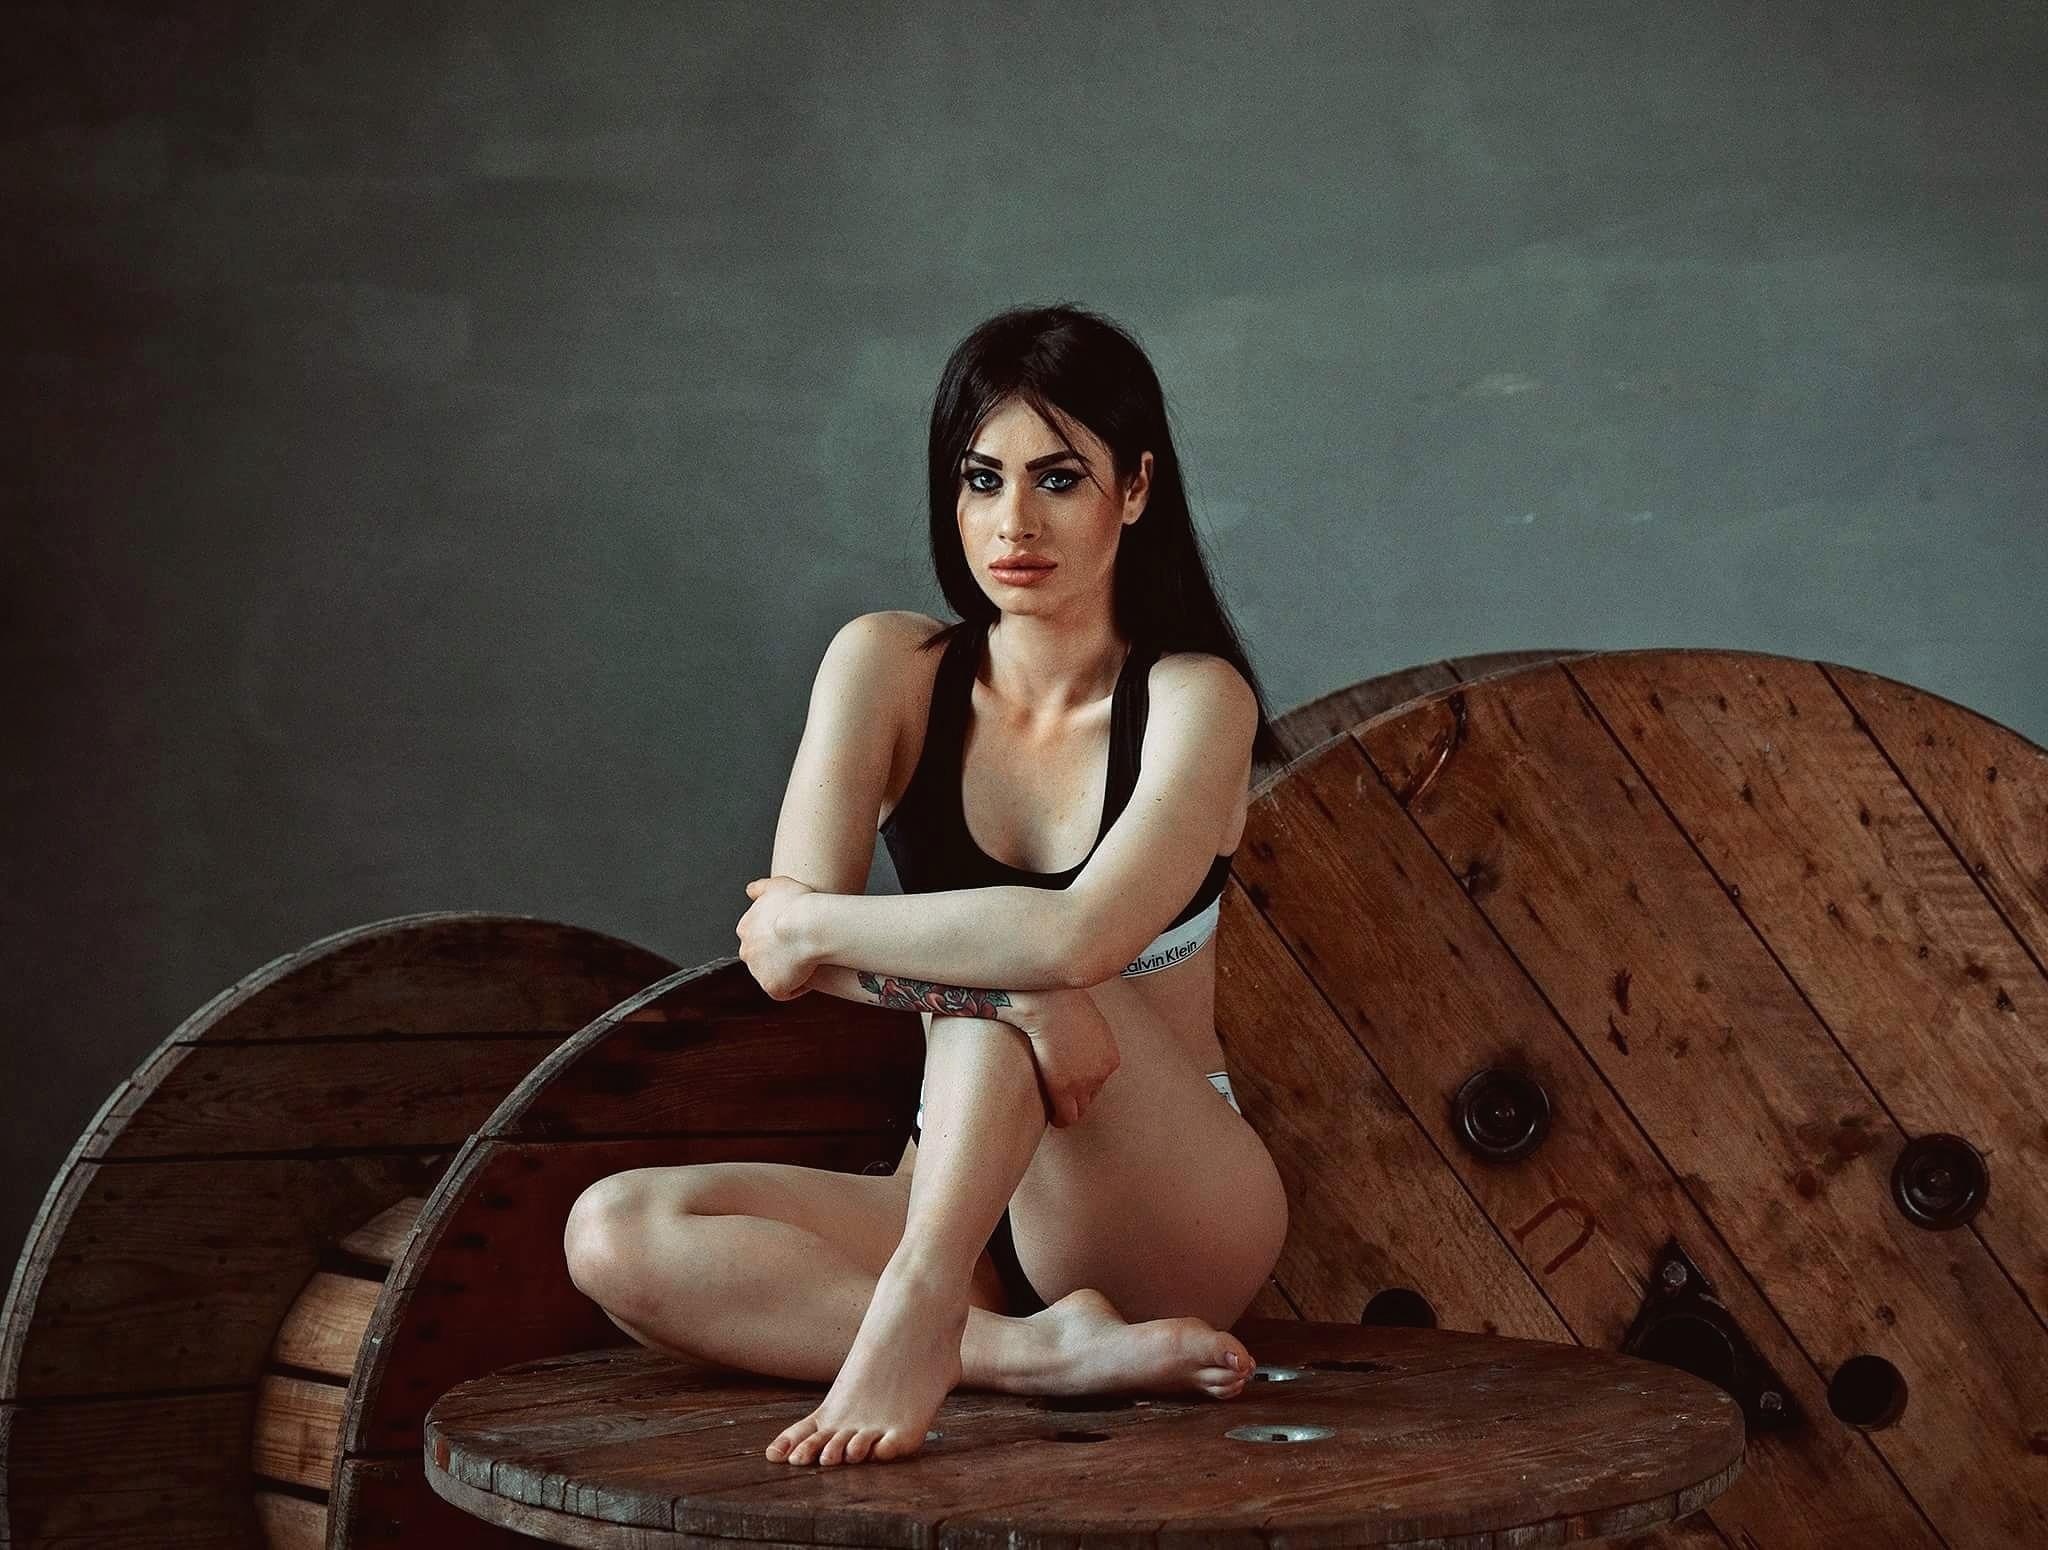 Giada by Gioia Altea